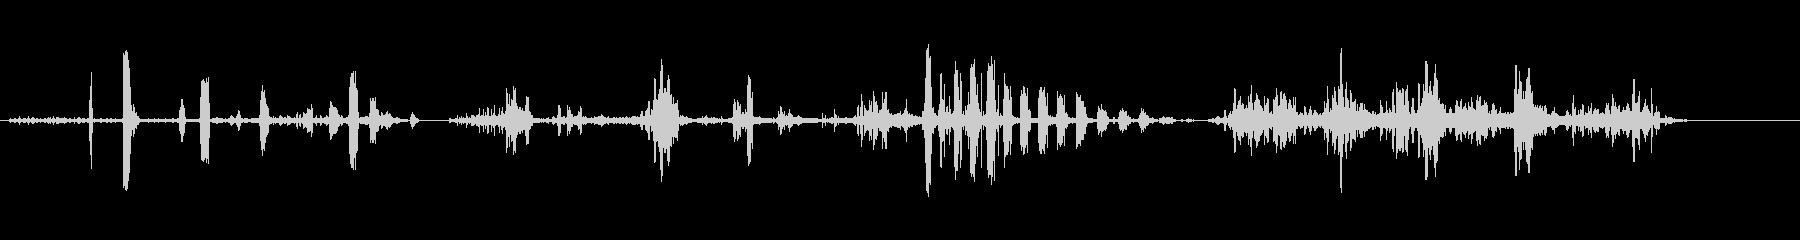 porron-モレルの未再生の波形